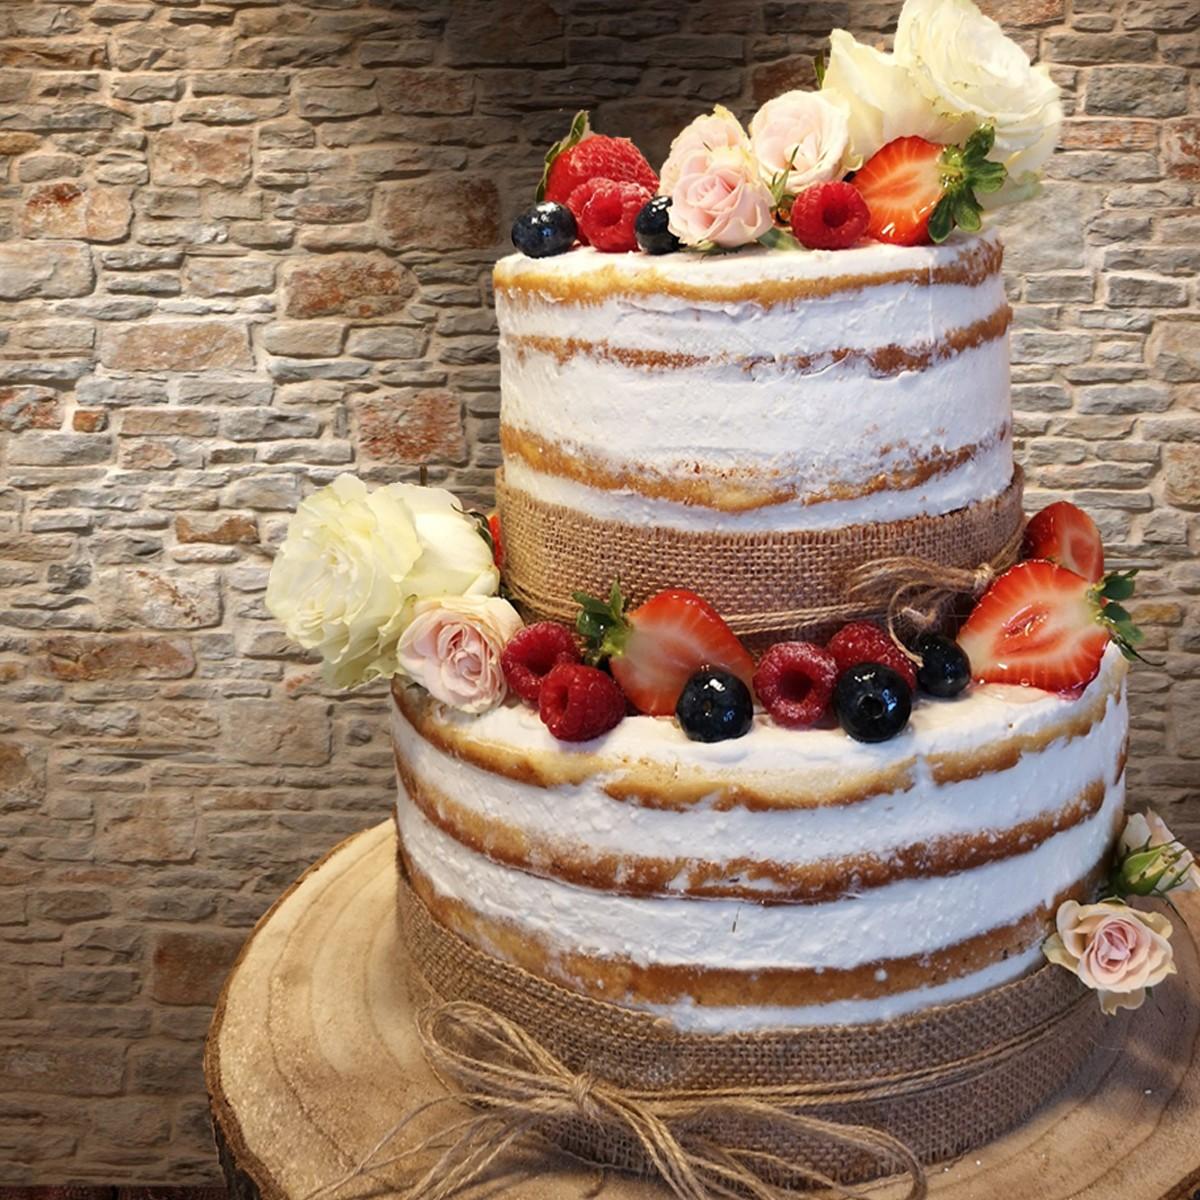 La Cuchara de Mermelada: Tarta Naked Cake de frutos del